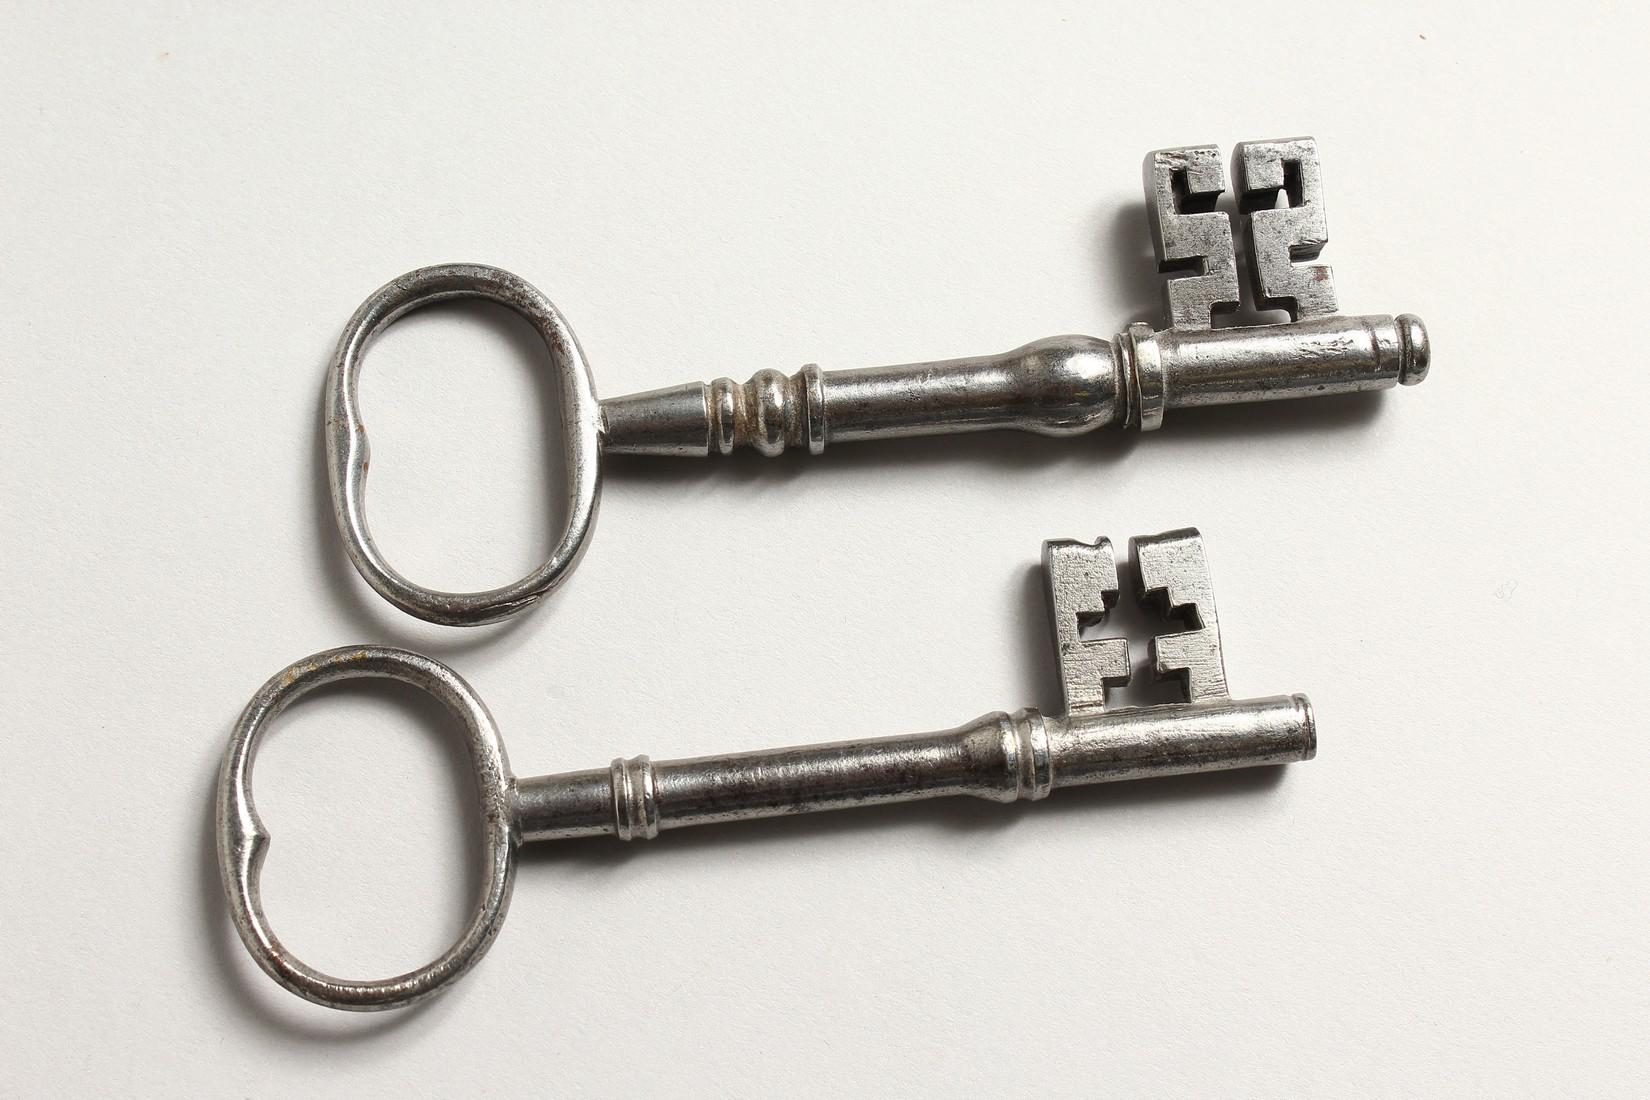 TWO OLD KEYS. Longest 13cm - Image 2 of 2